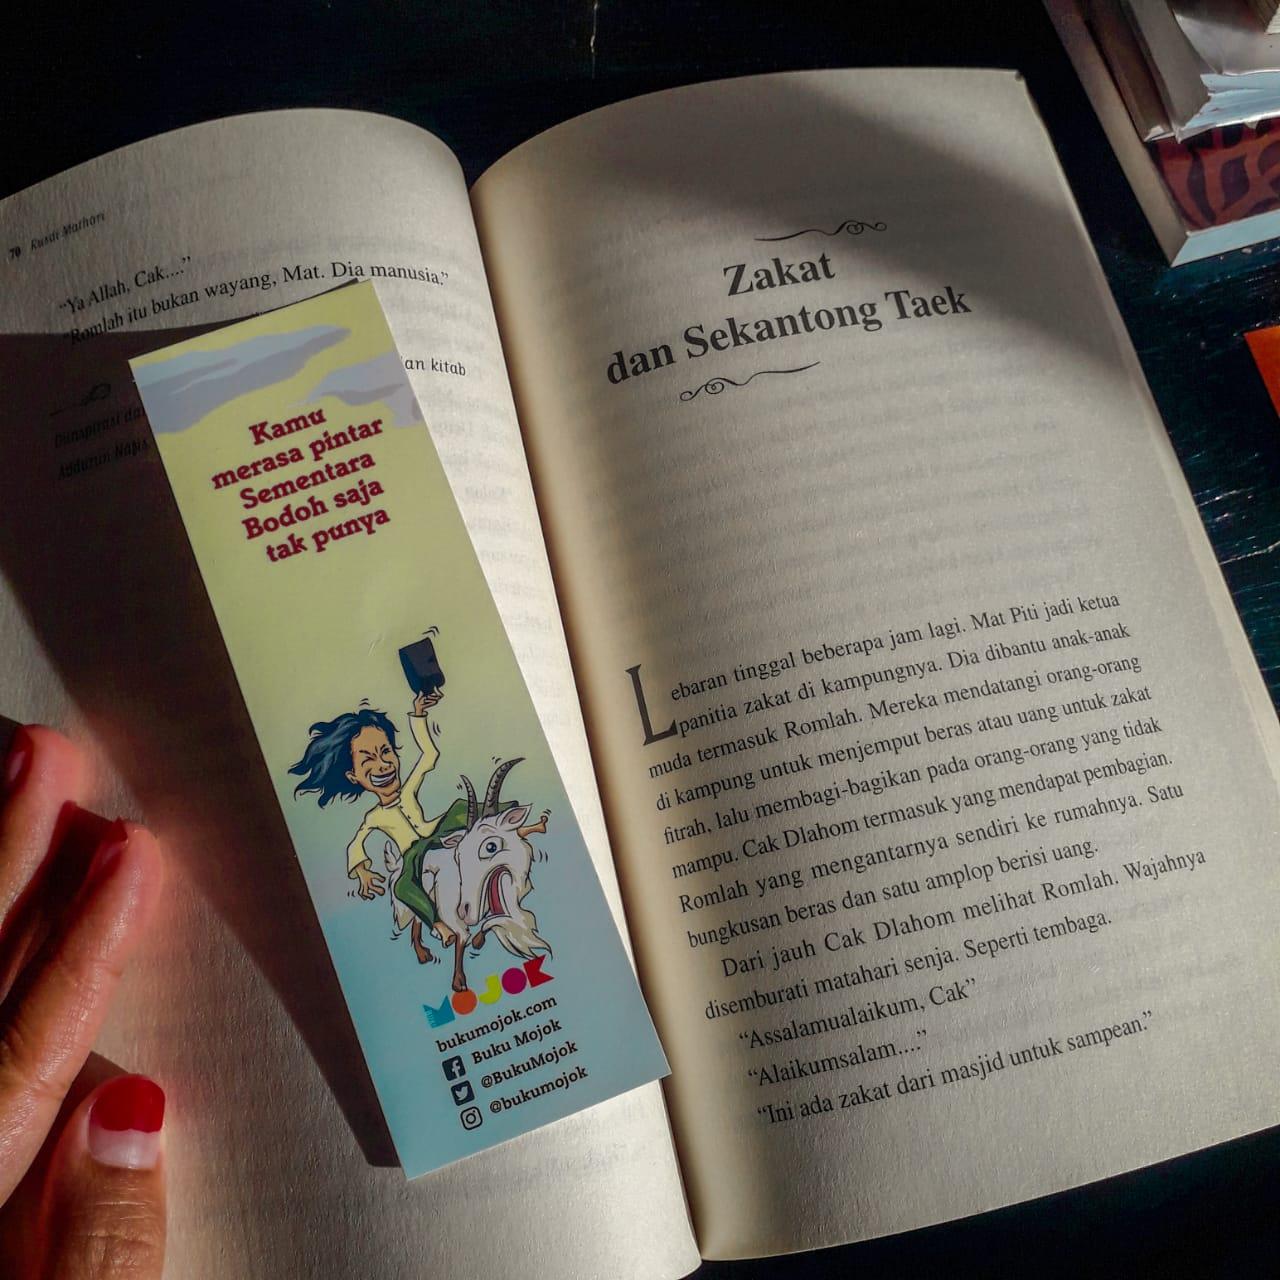 Buku Merasa Pintar Bodoh Saja Tak Punya Kisah Sufi dari Madura